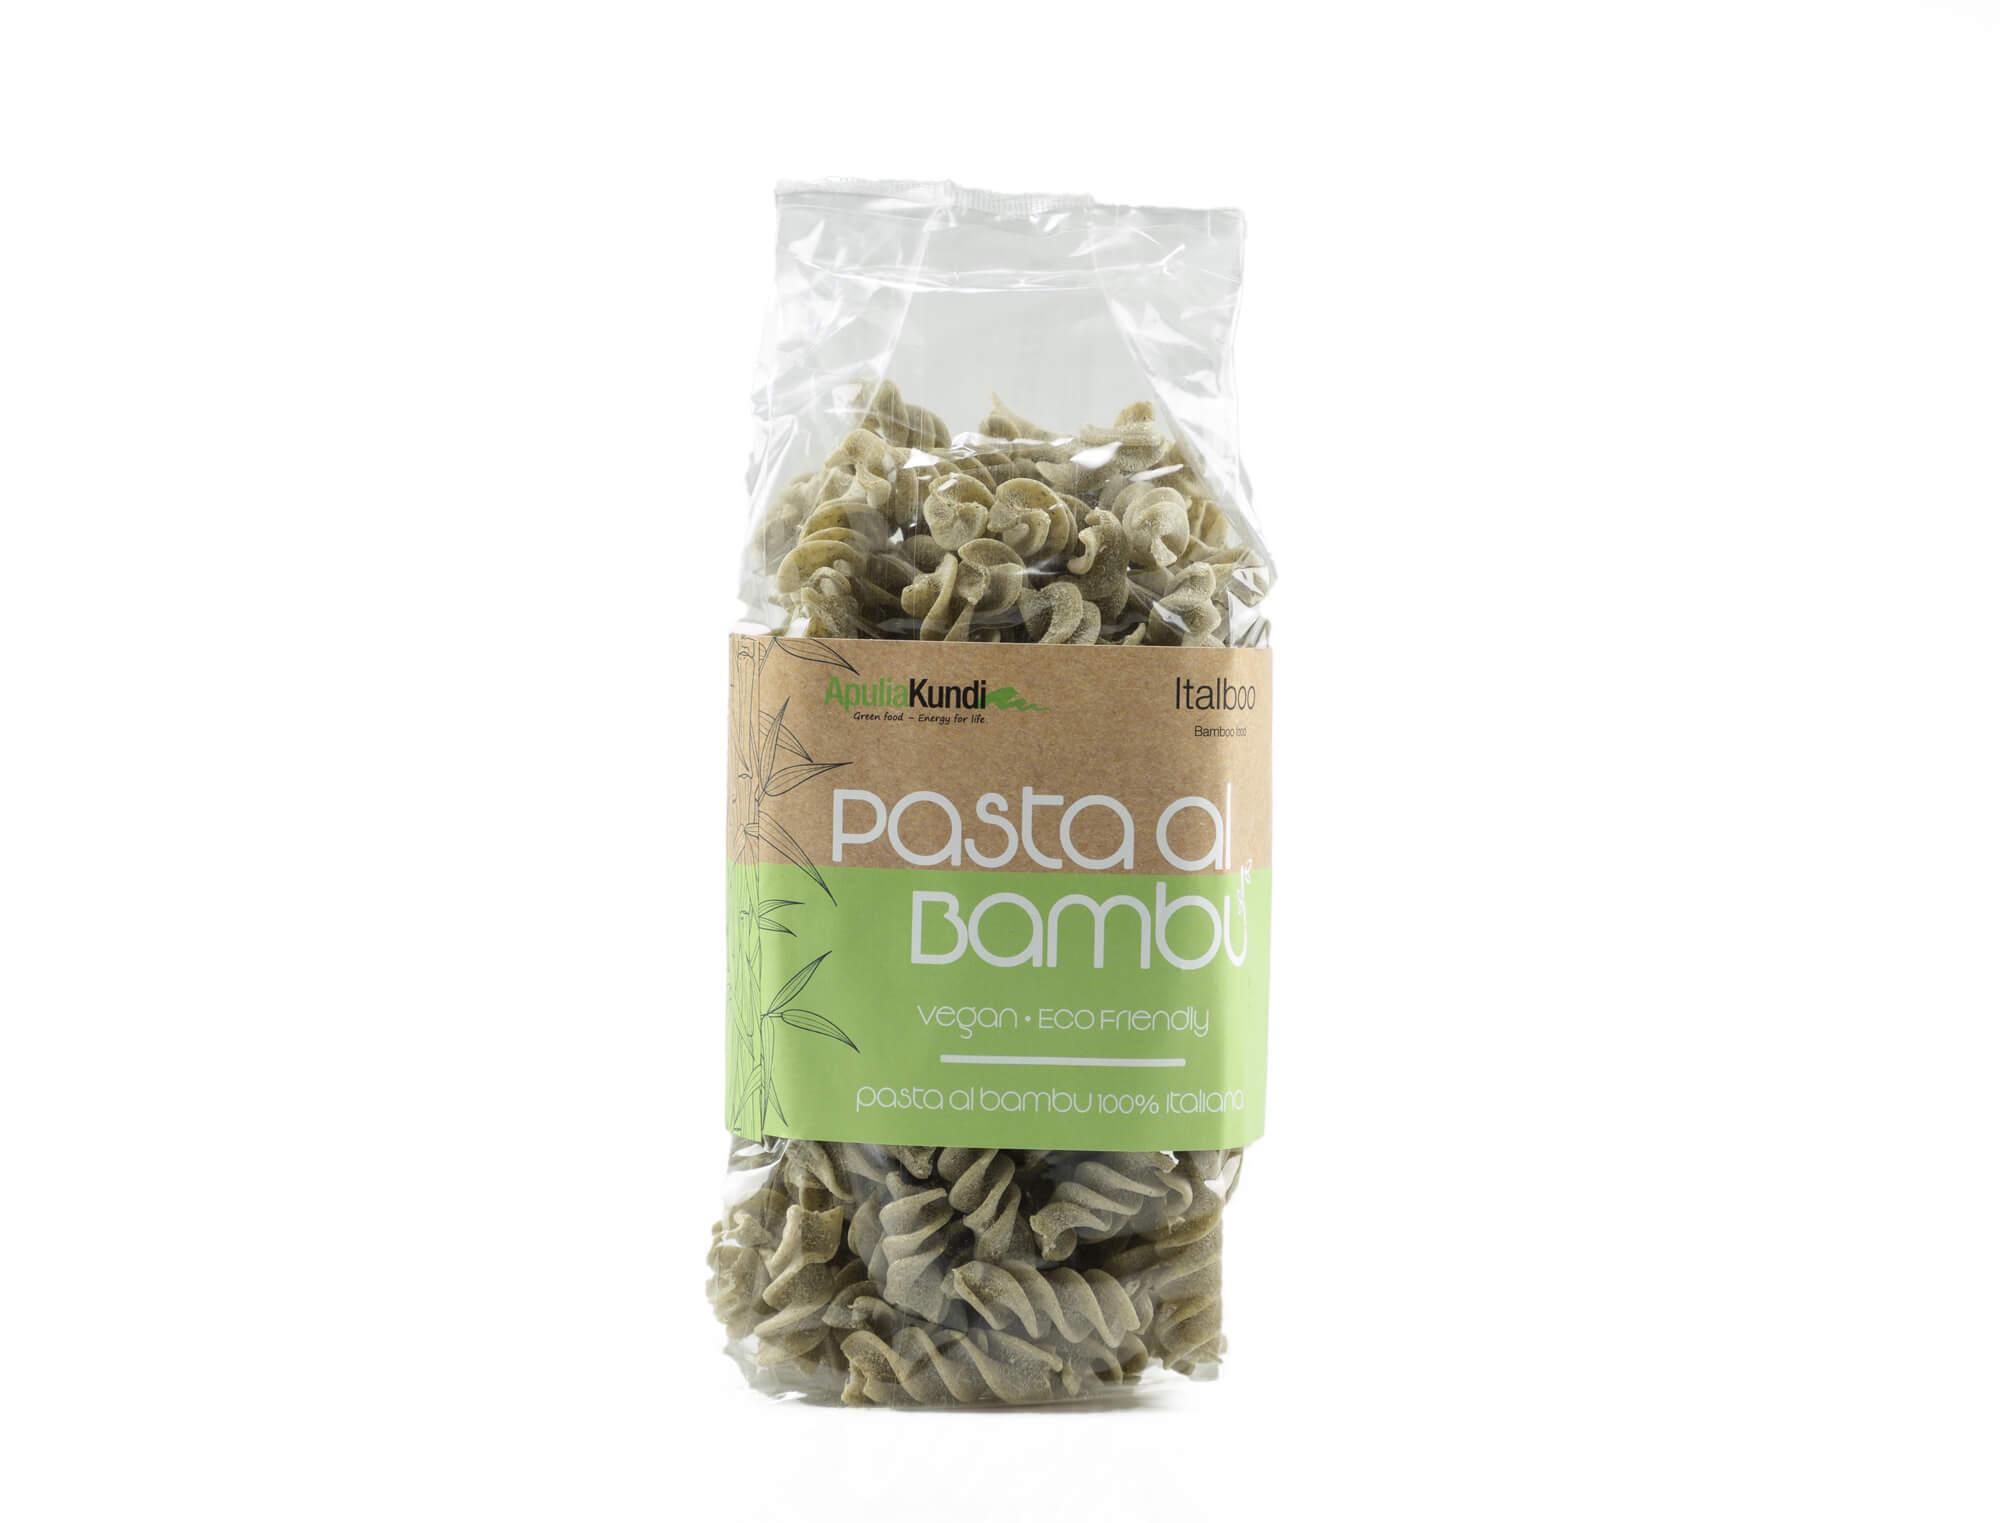 Bamboo pasta